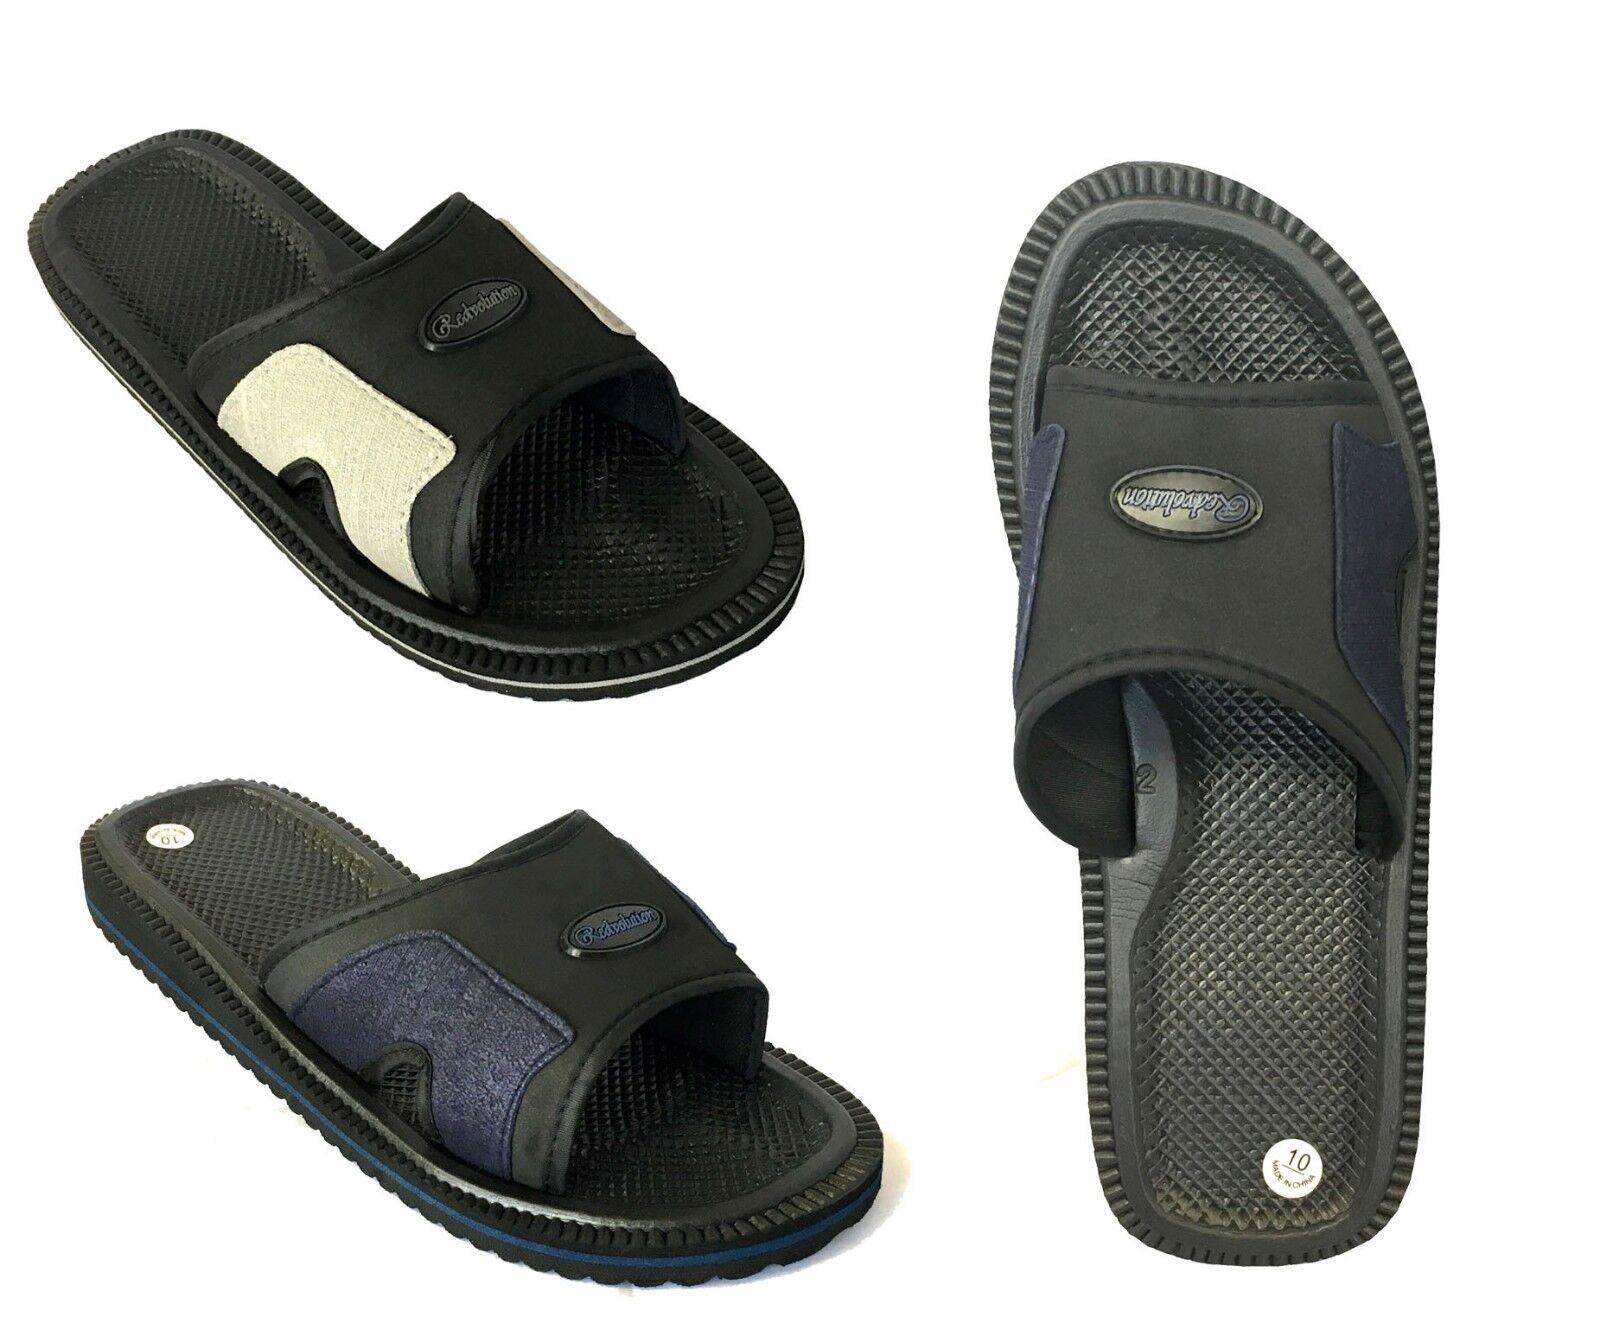 New Women's Sports Walking Slide Sandals for Garden~Gym~Comfort Walking Sports Clearance || d8aee4